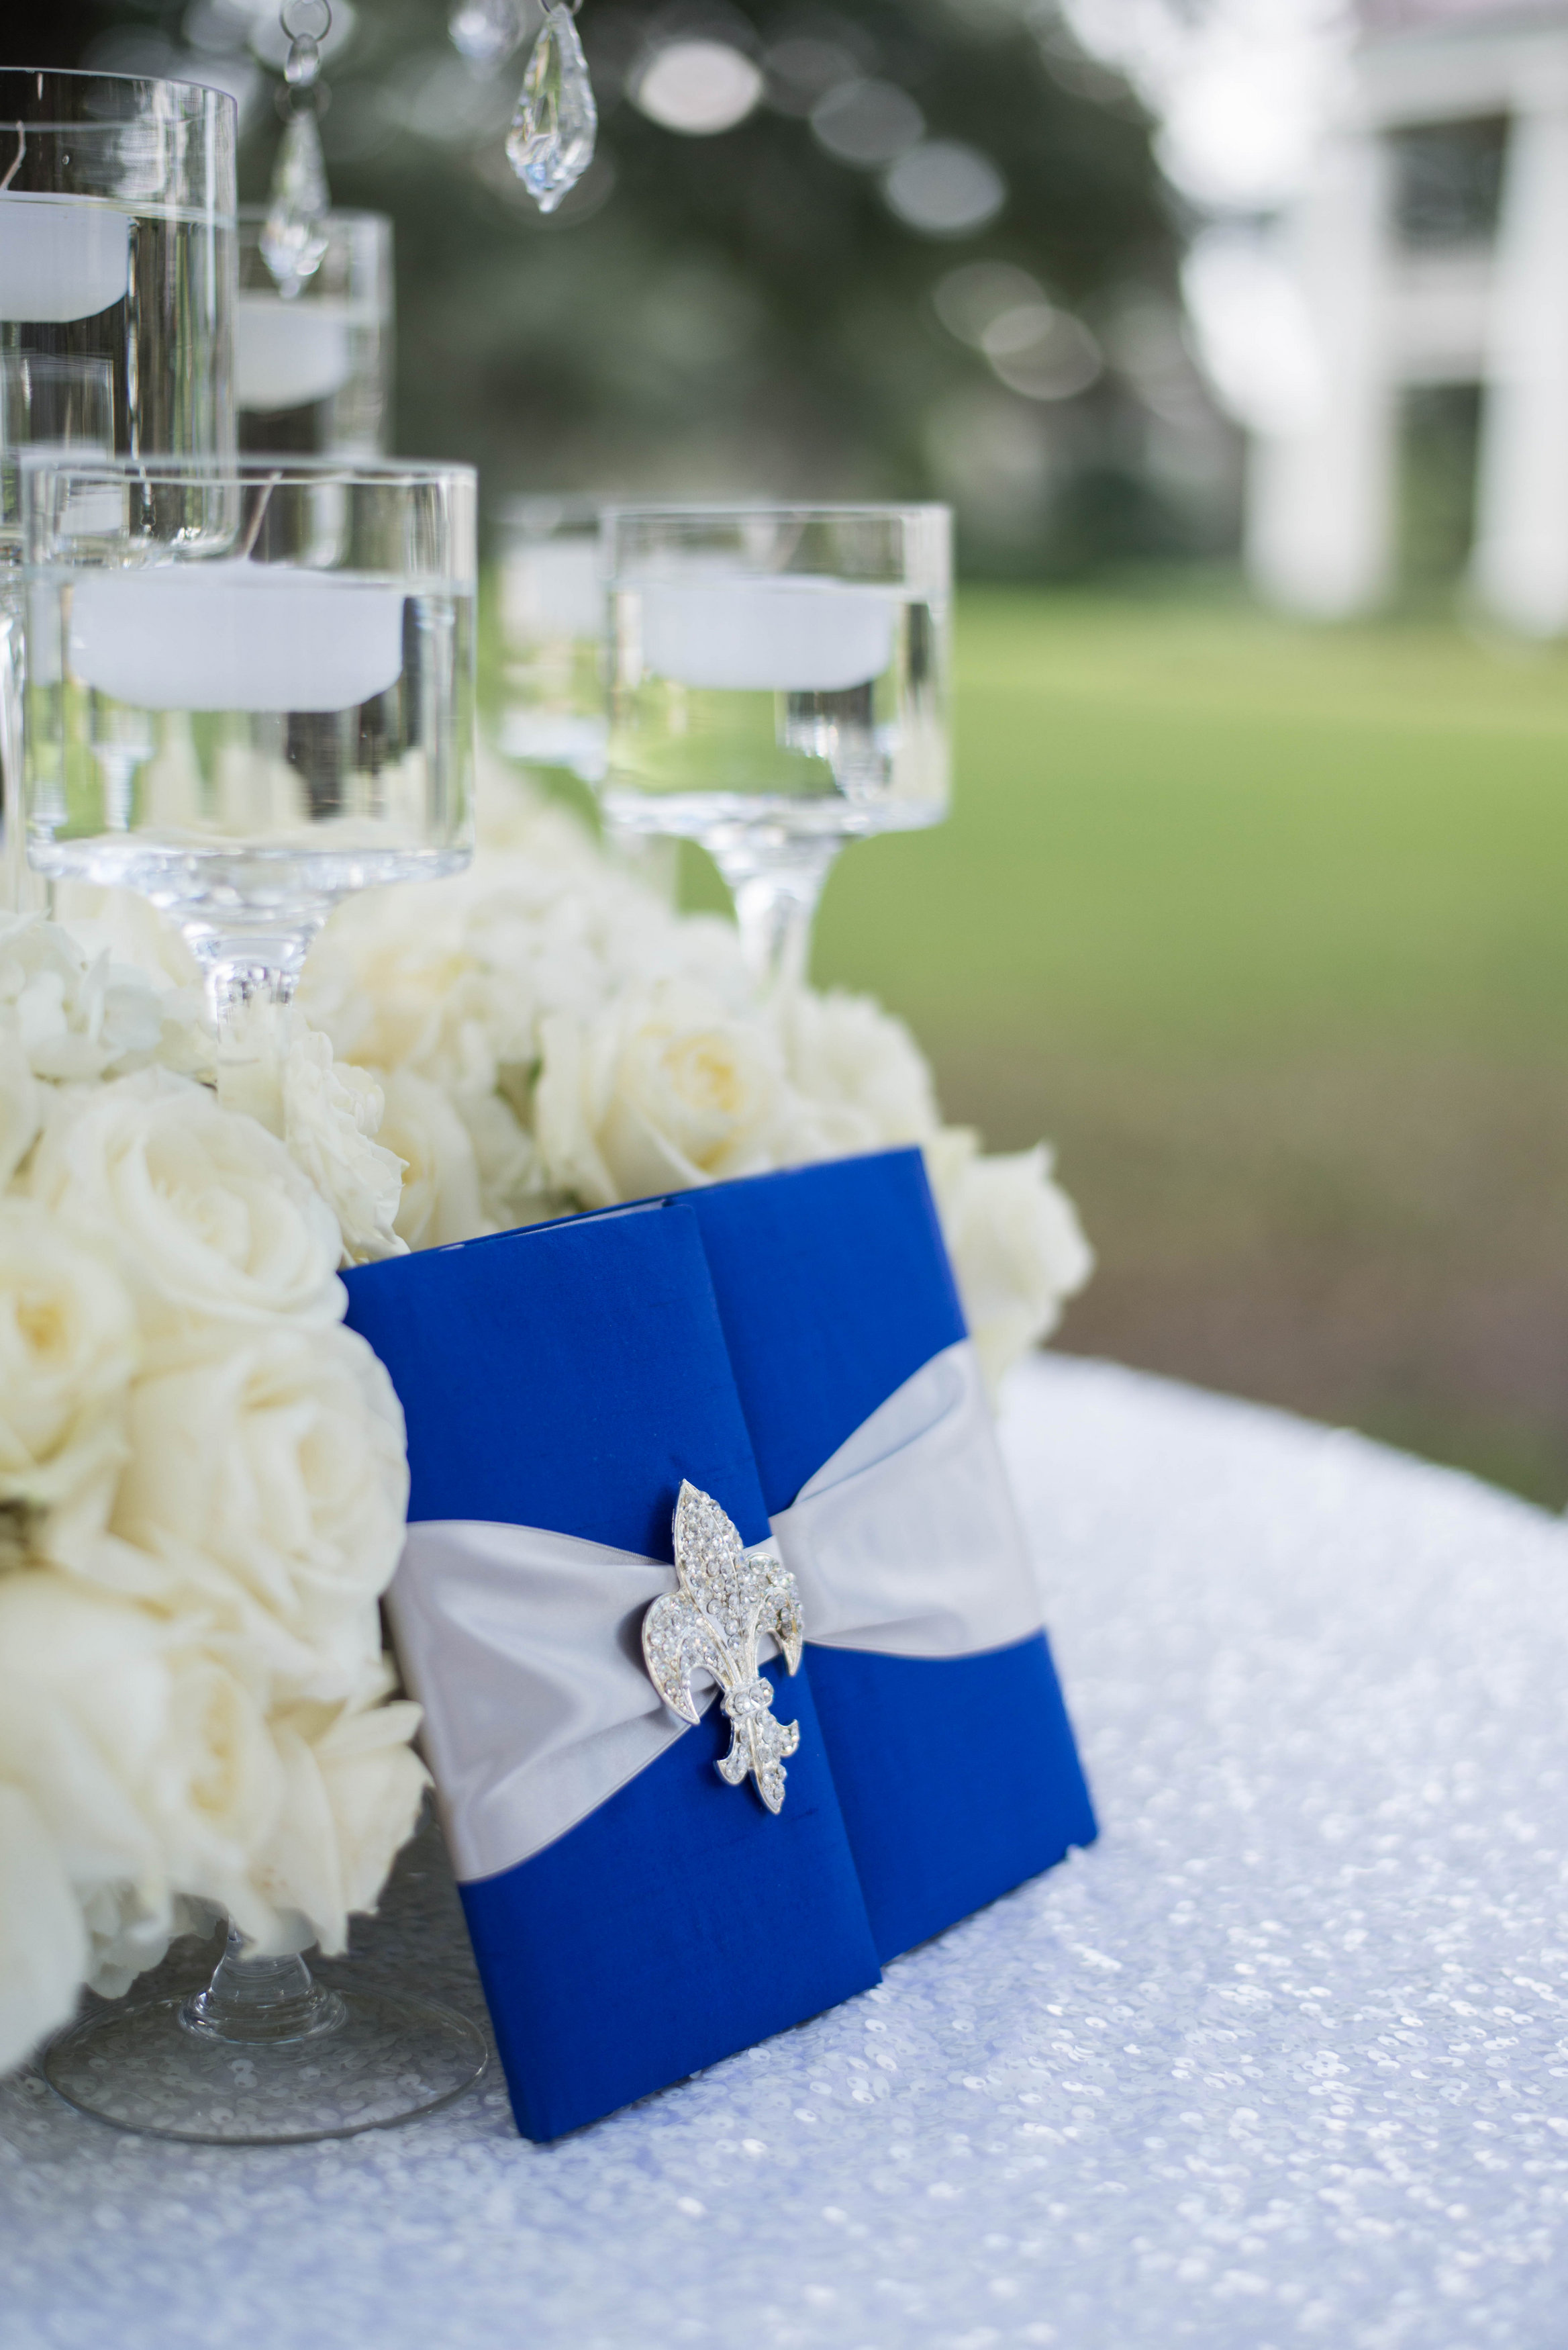 BRW - Invitation with Fleur De Lis Crystal - Partee Wedding - Bobbi Rice Weddings - Heather Grimm Photography.jpg